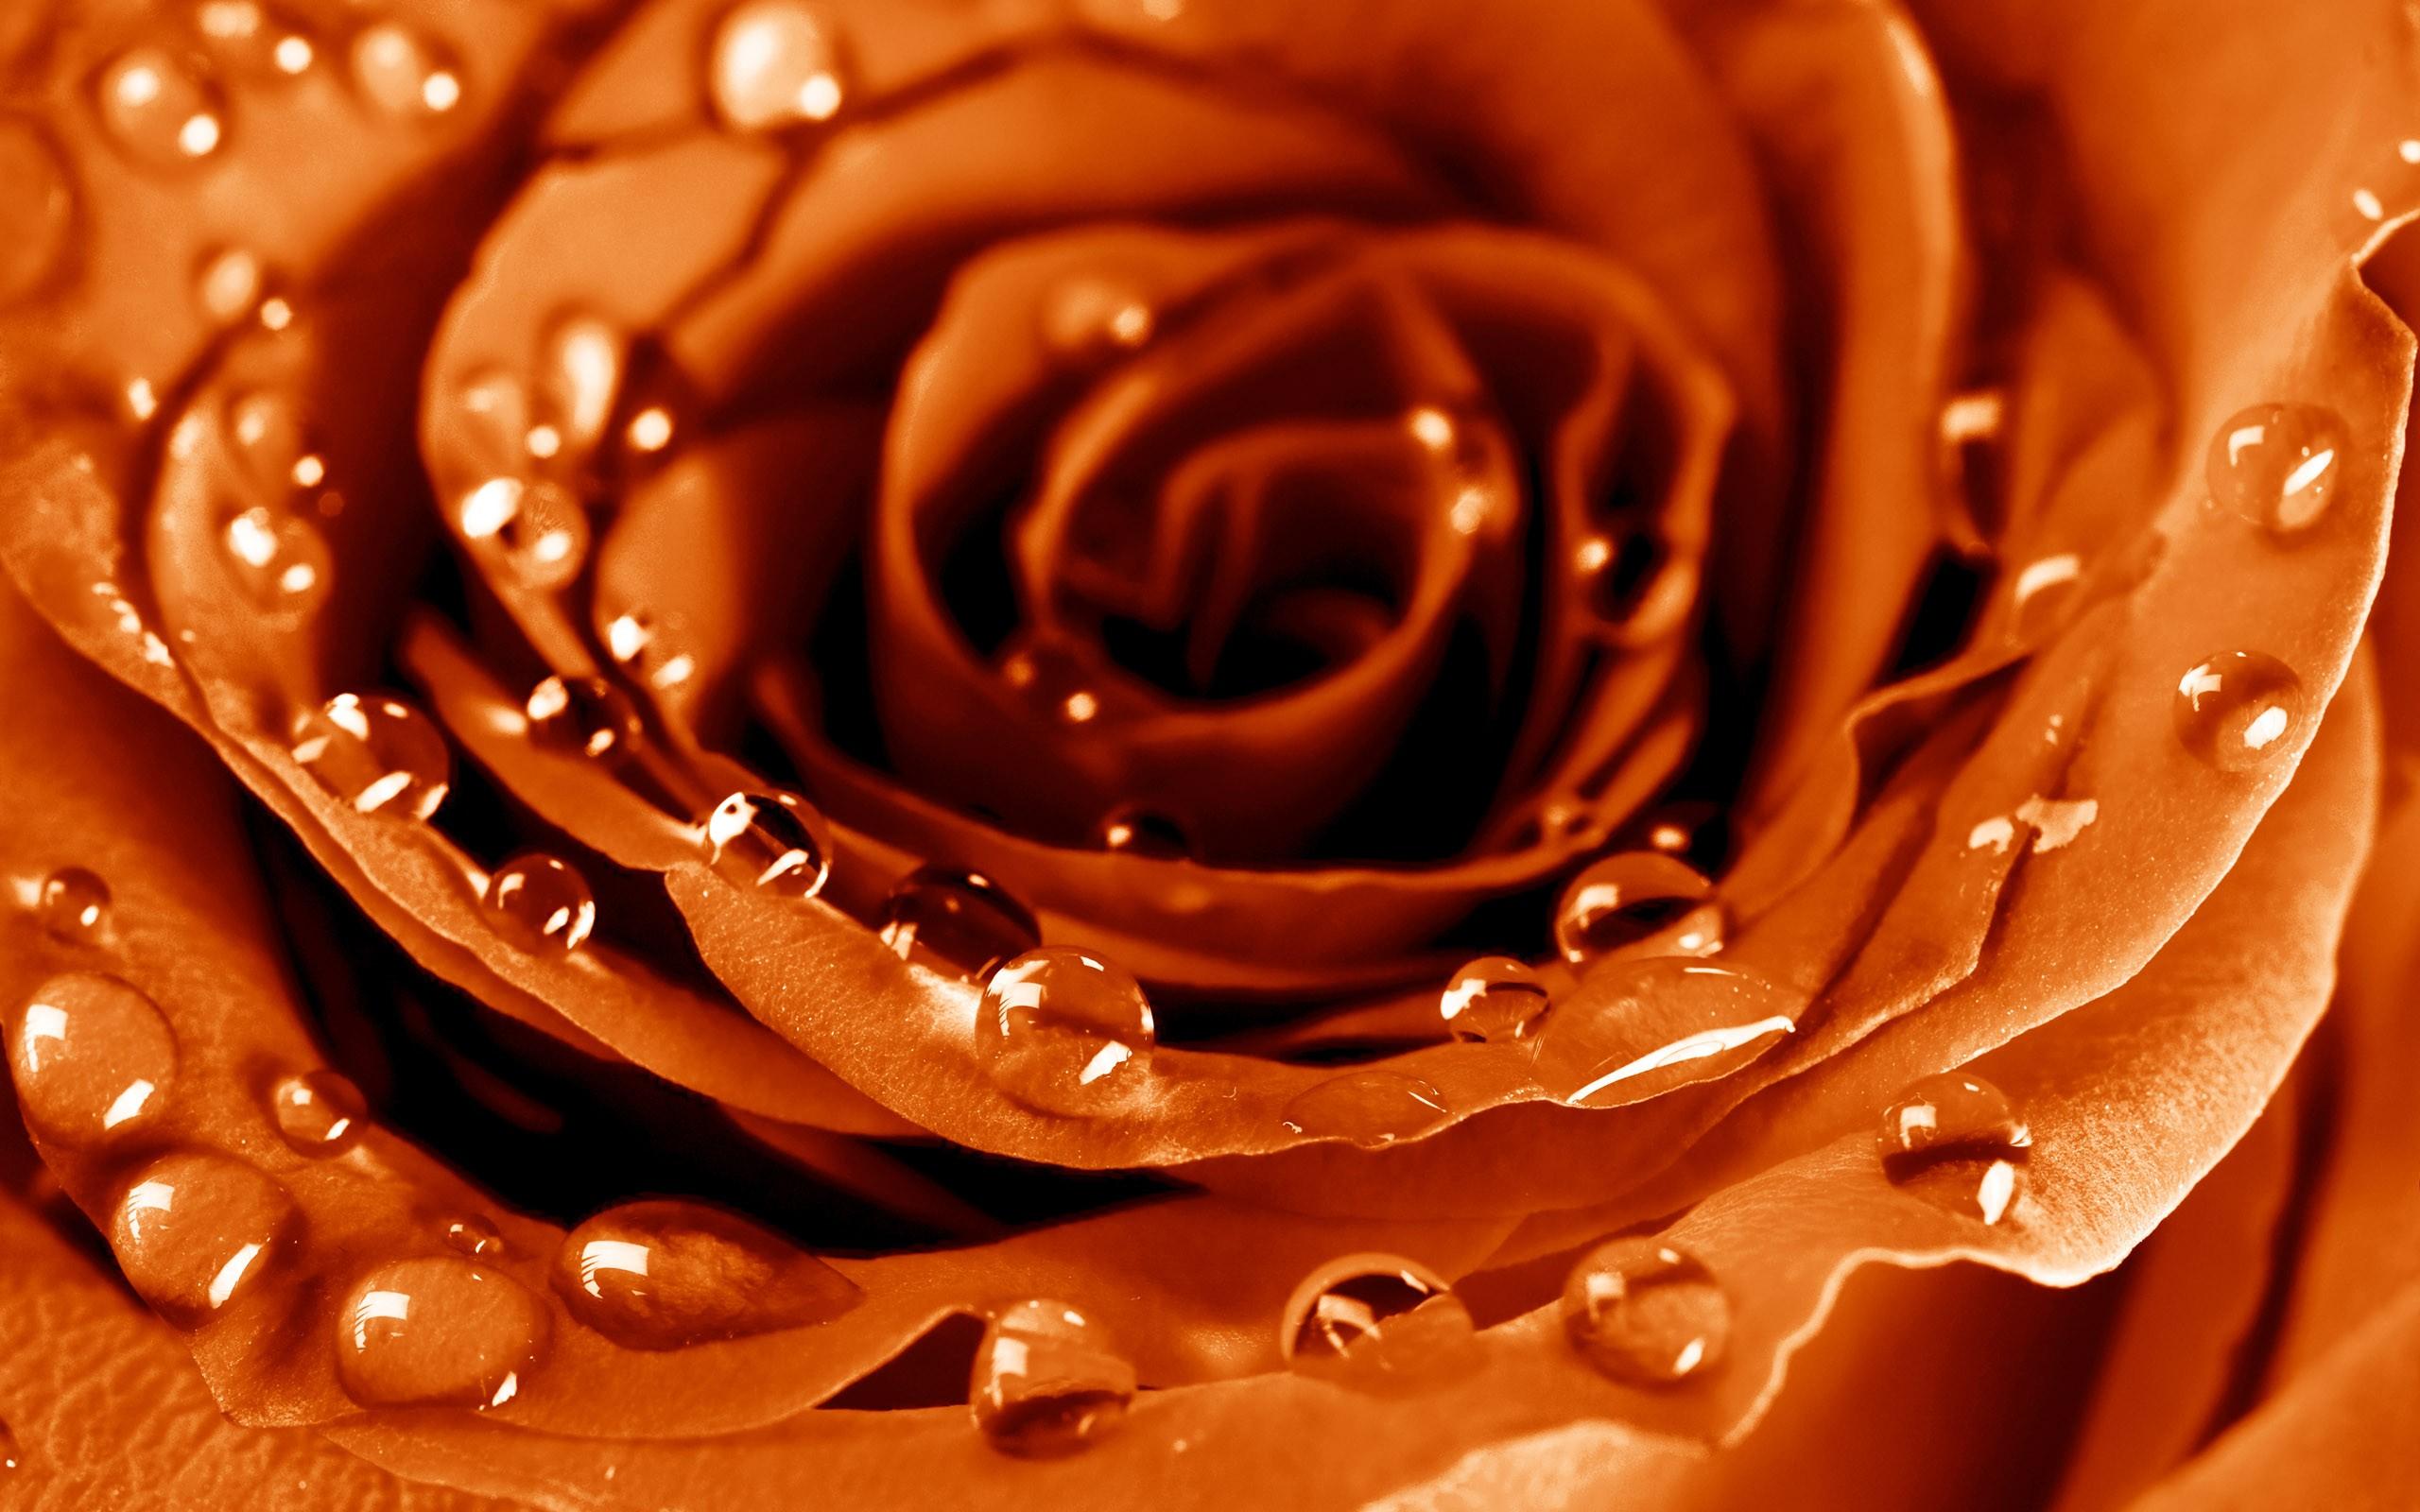 Fondos Flores ADNFriki (9)